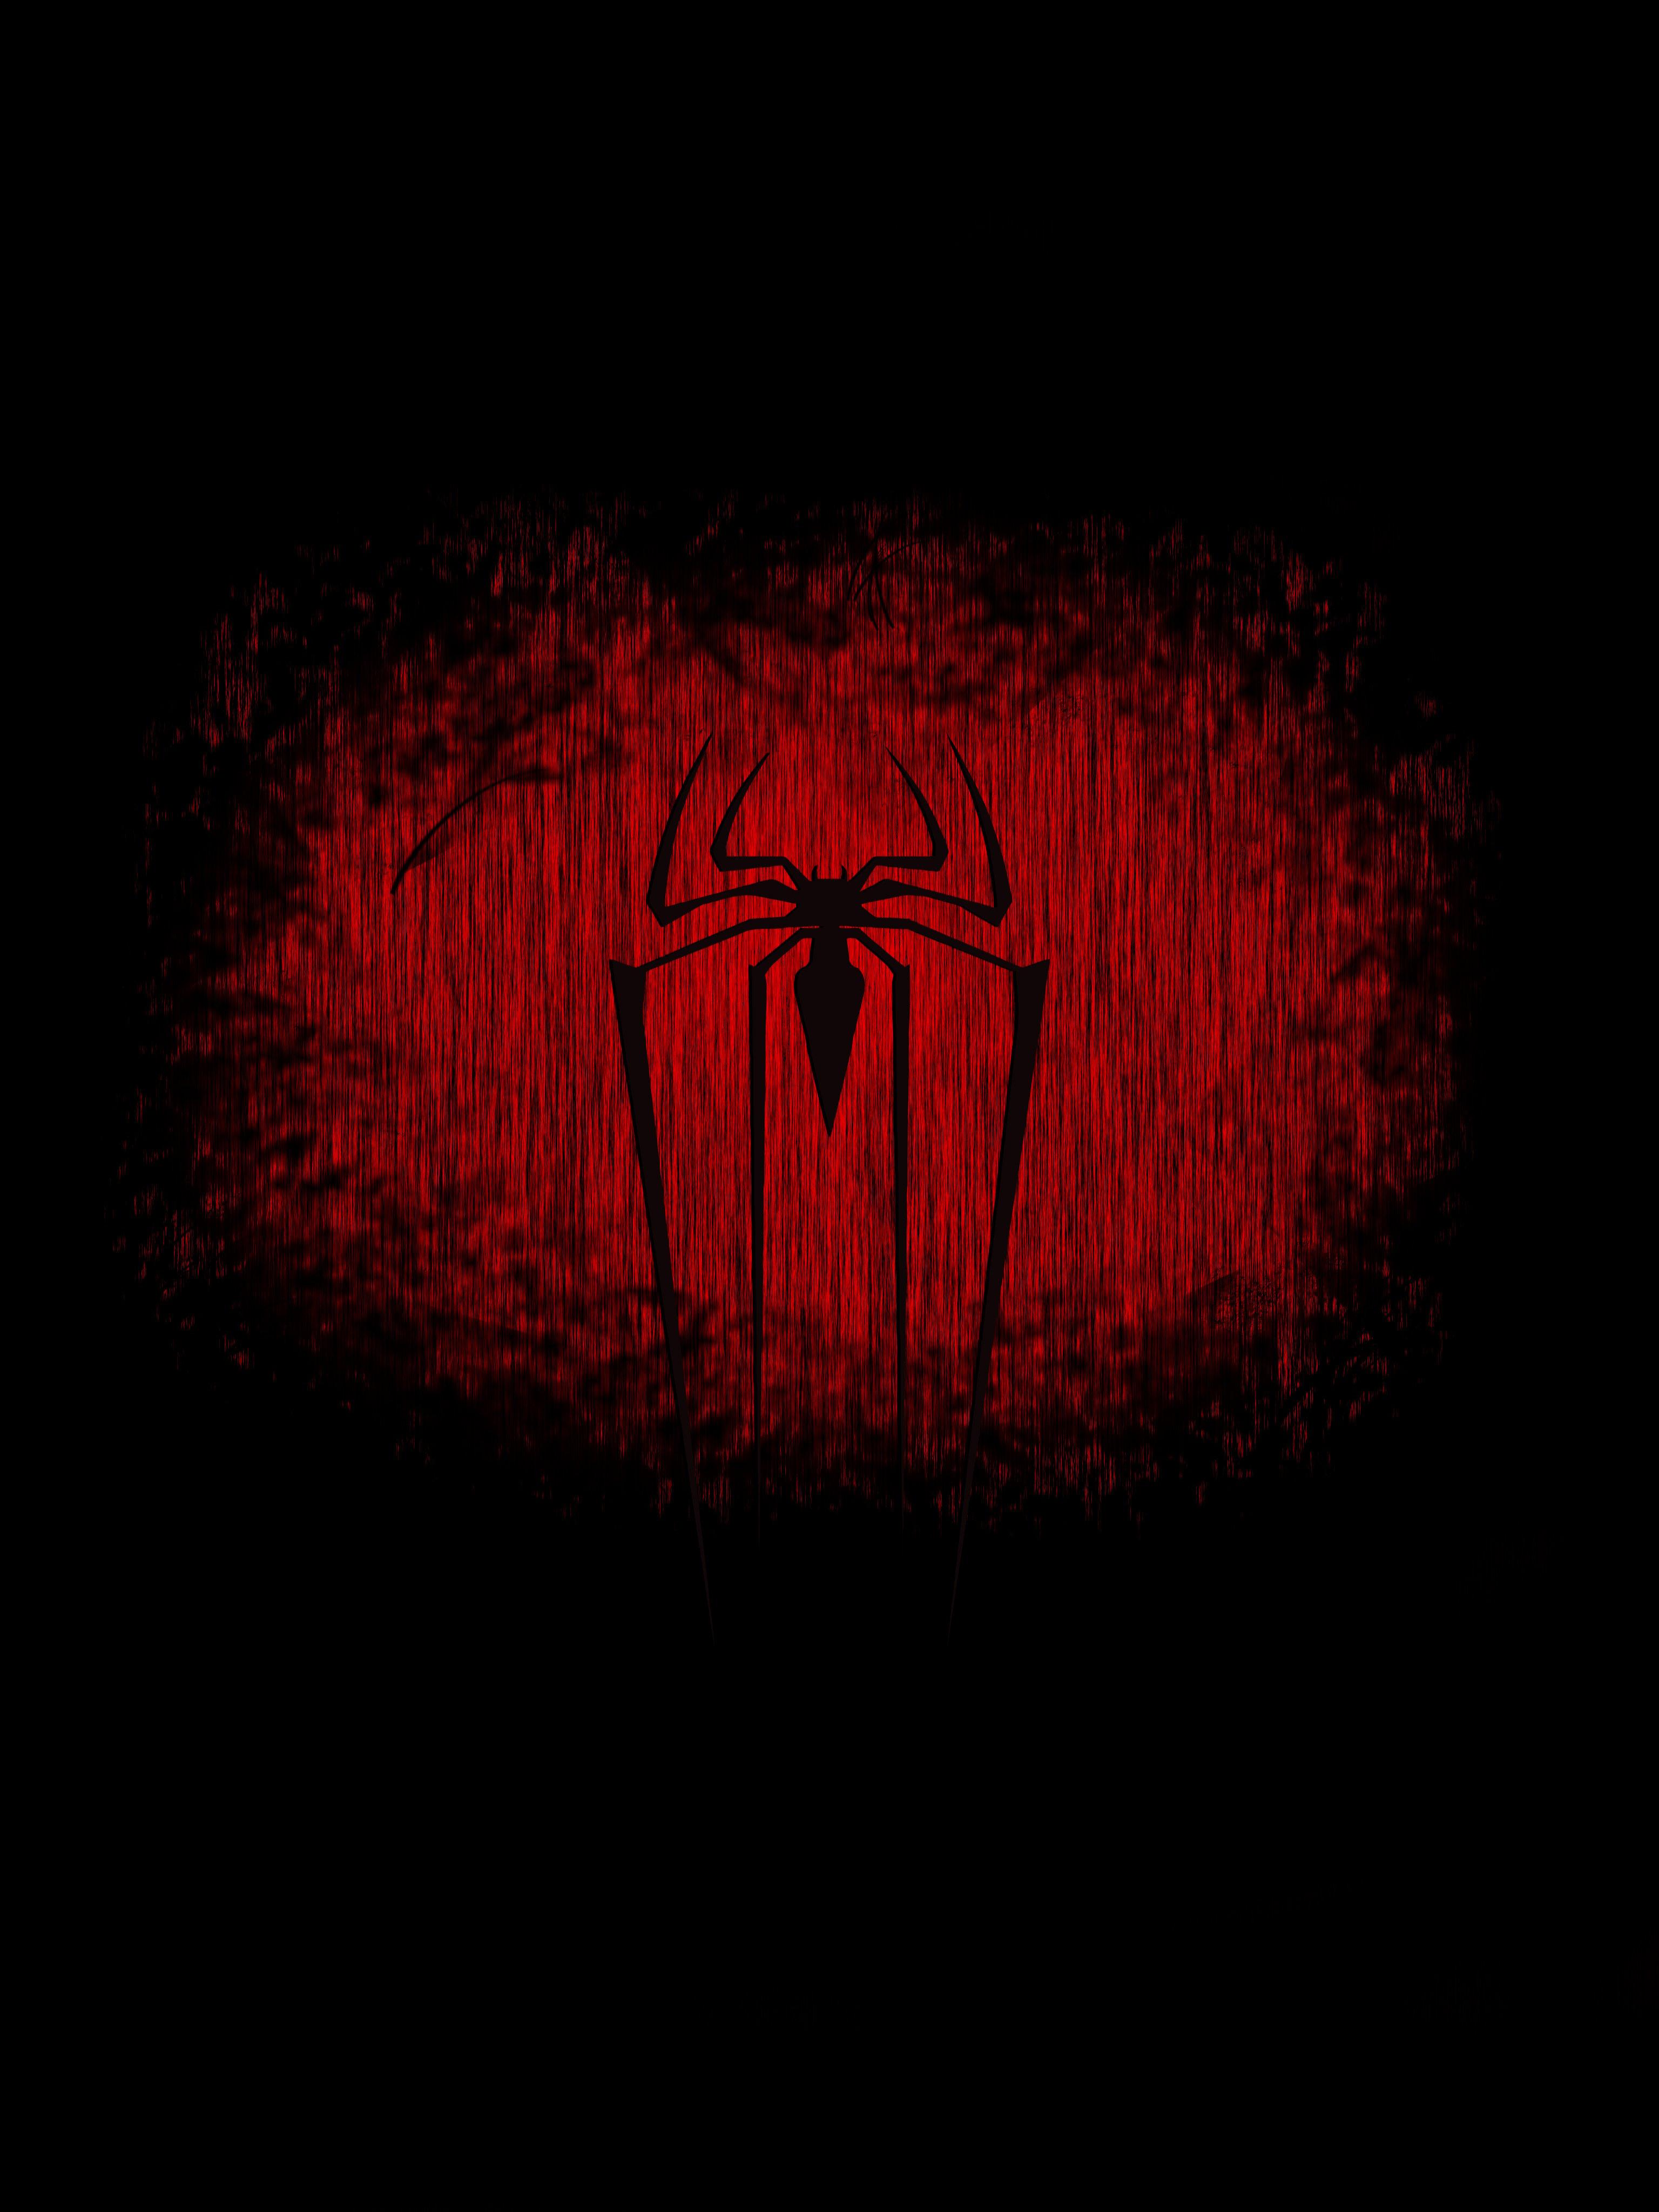 Amazing spider man logo wallpaper - photo#12